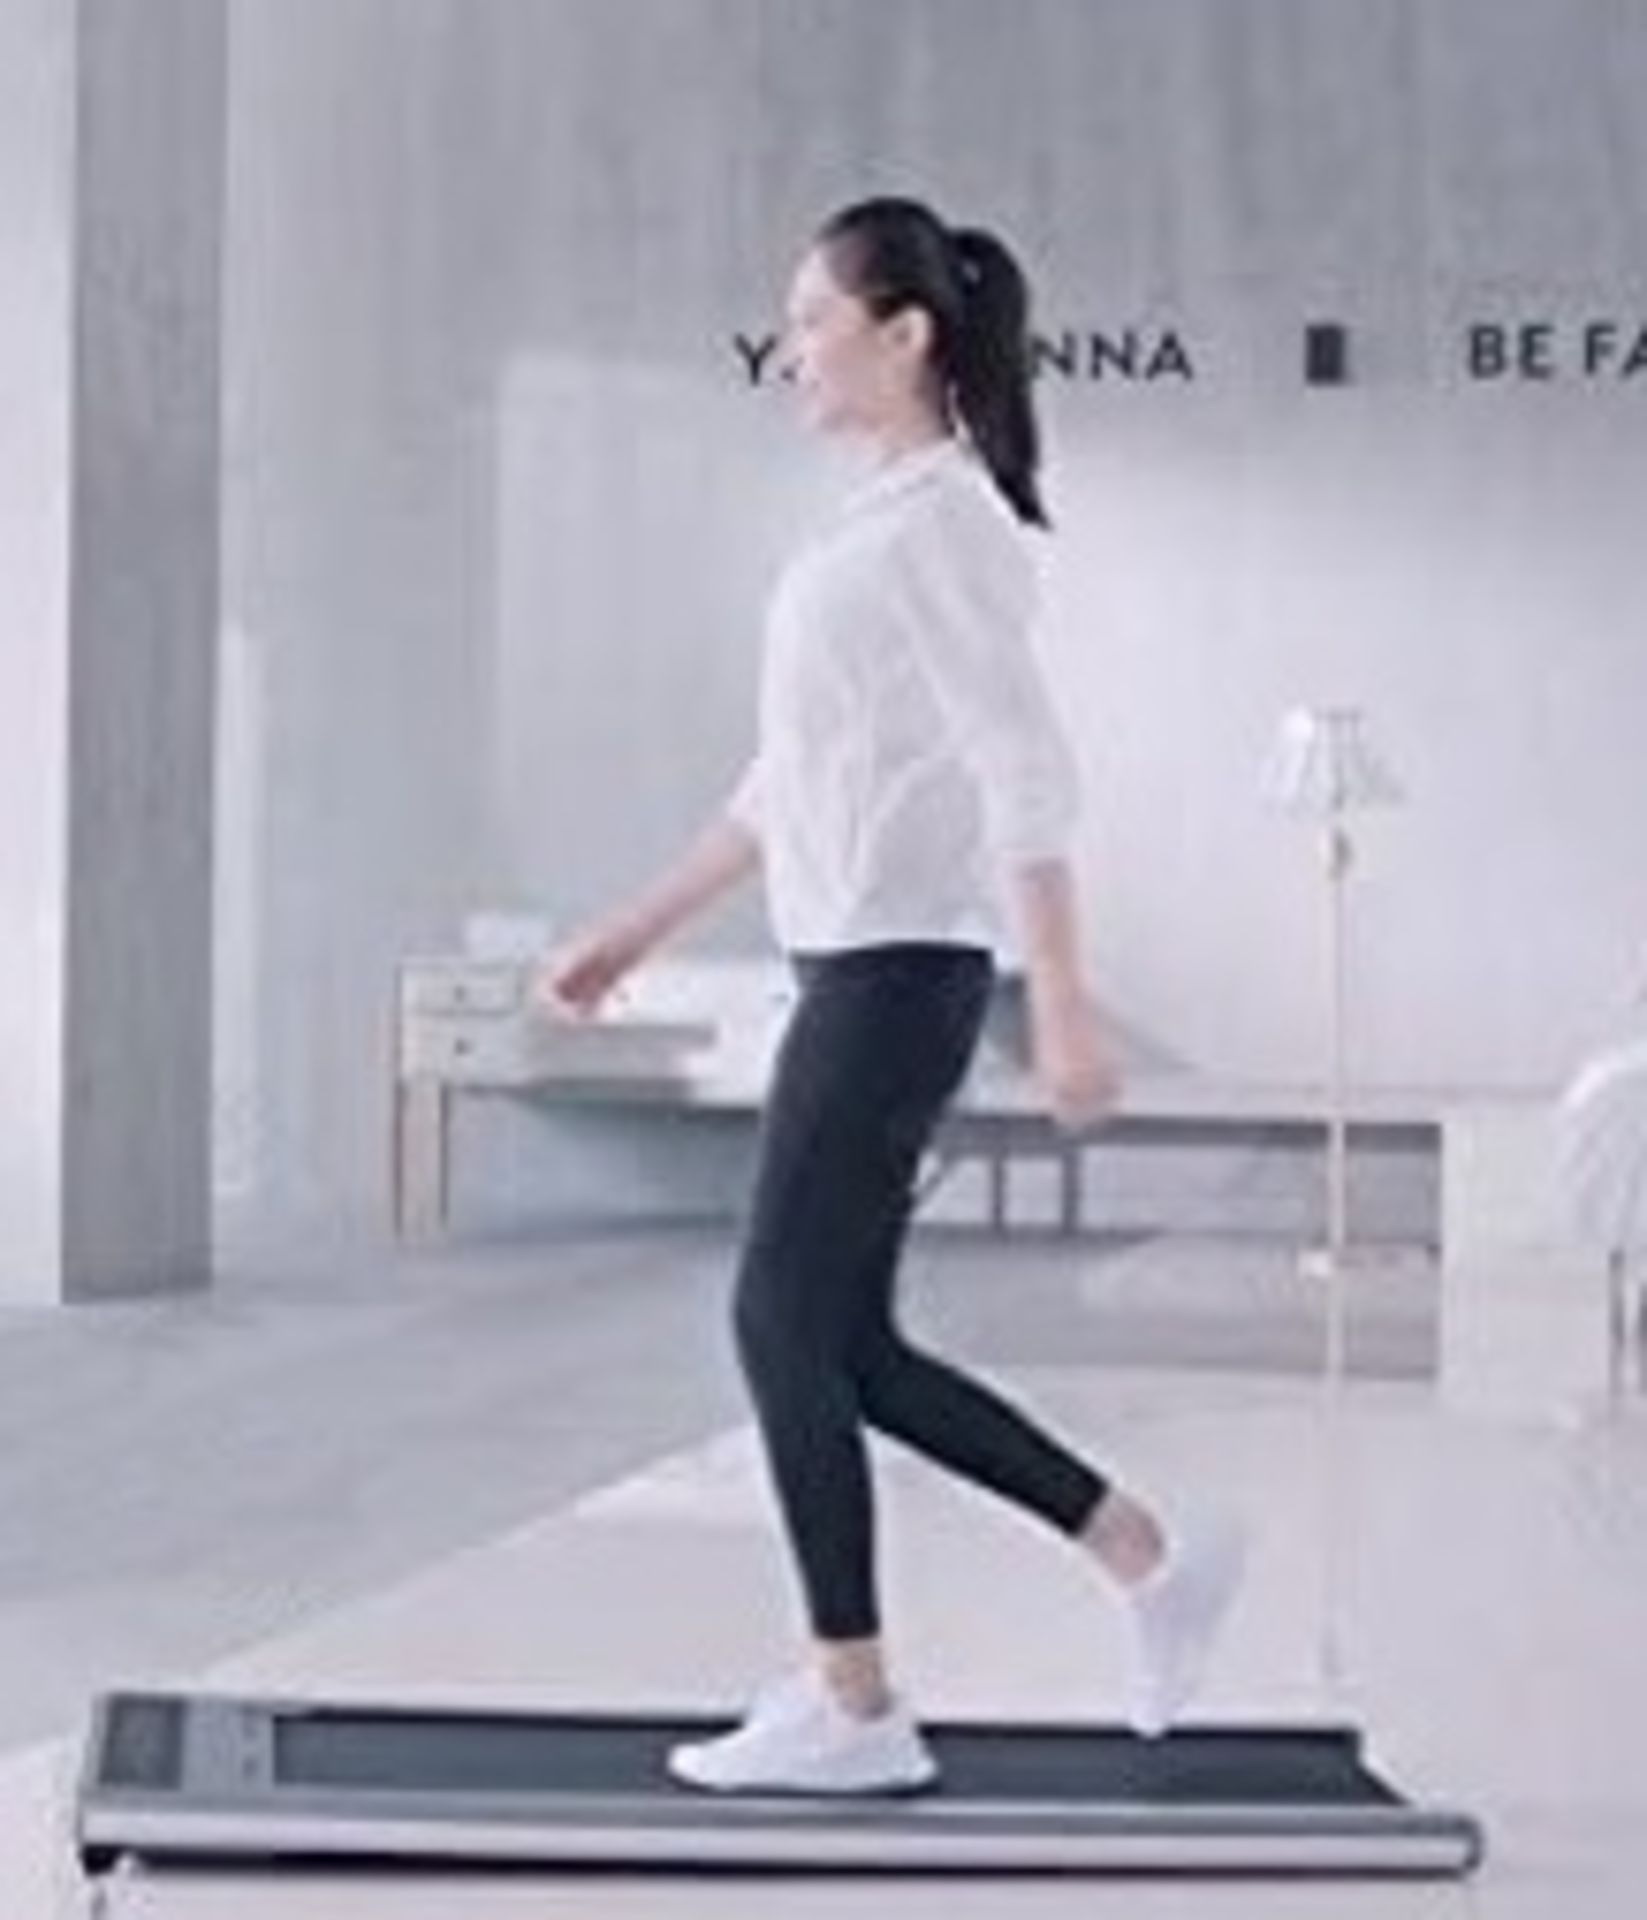 1 x Slim Tread Ultra Thin Smart Treadmill Running / Walking Machine - Lightweight With Folding - Image 6 of 19